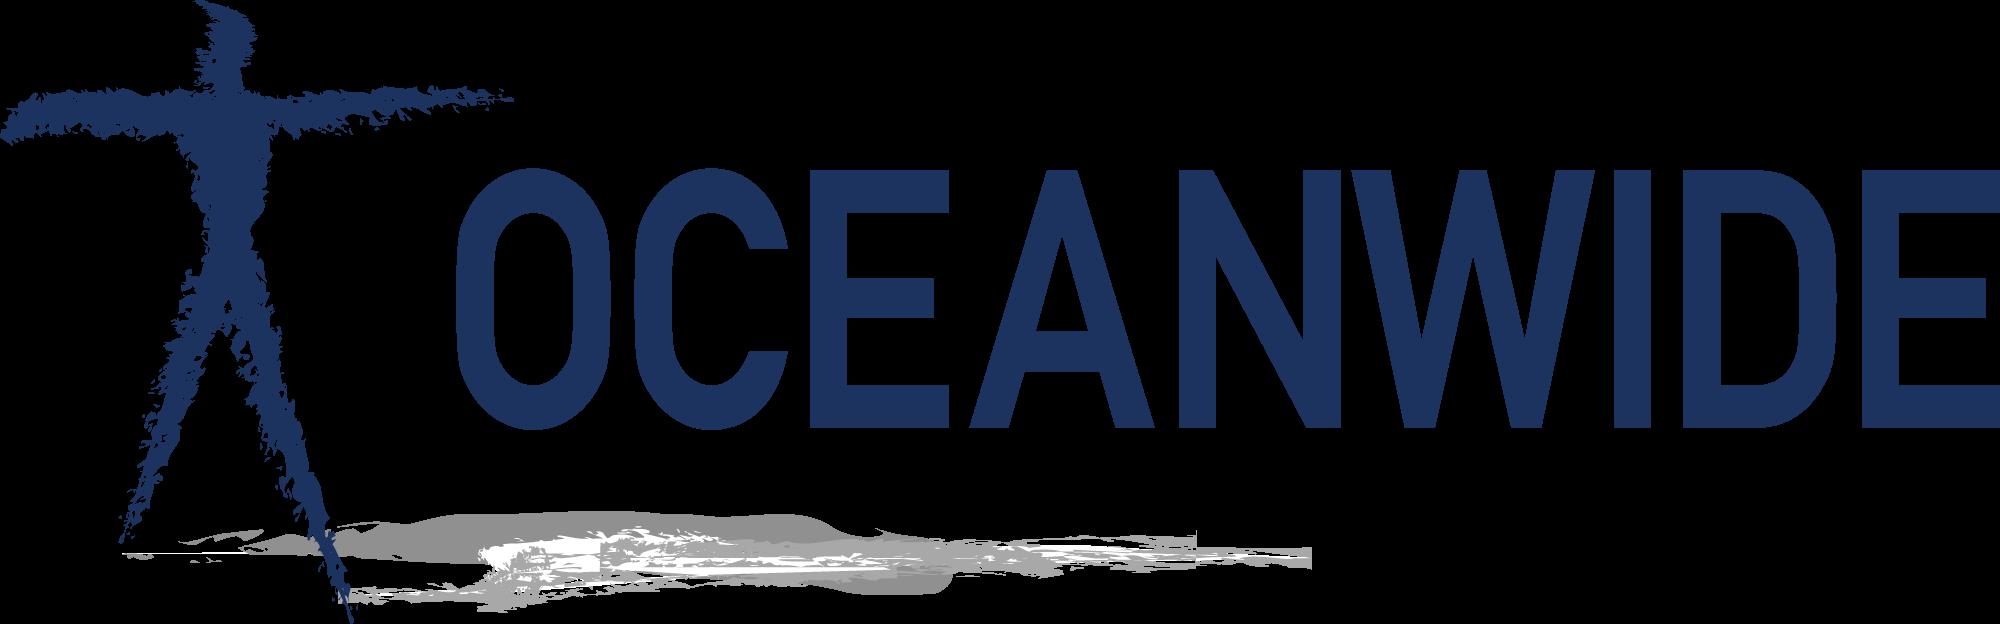 Oceanwide